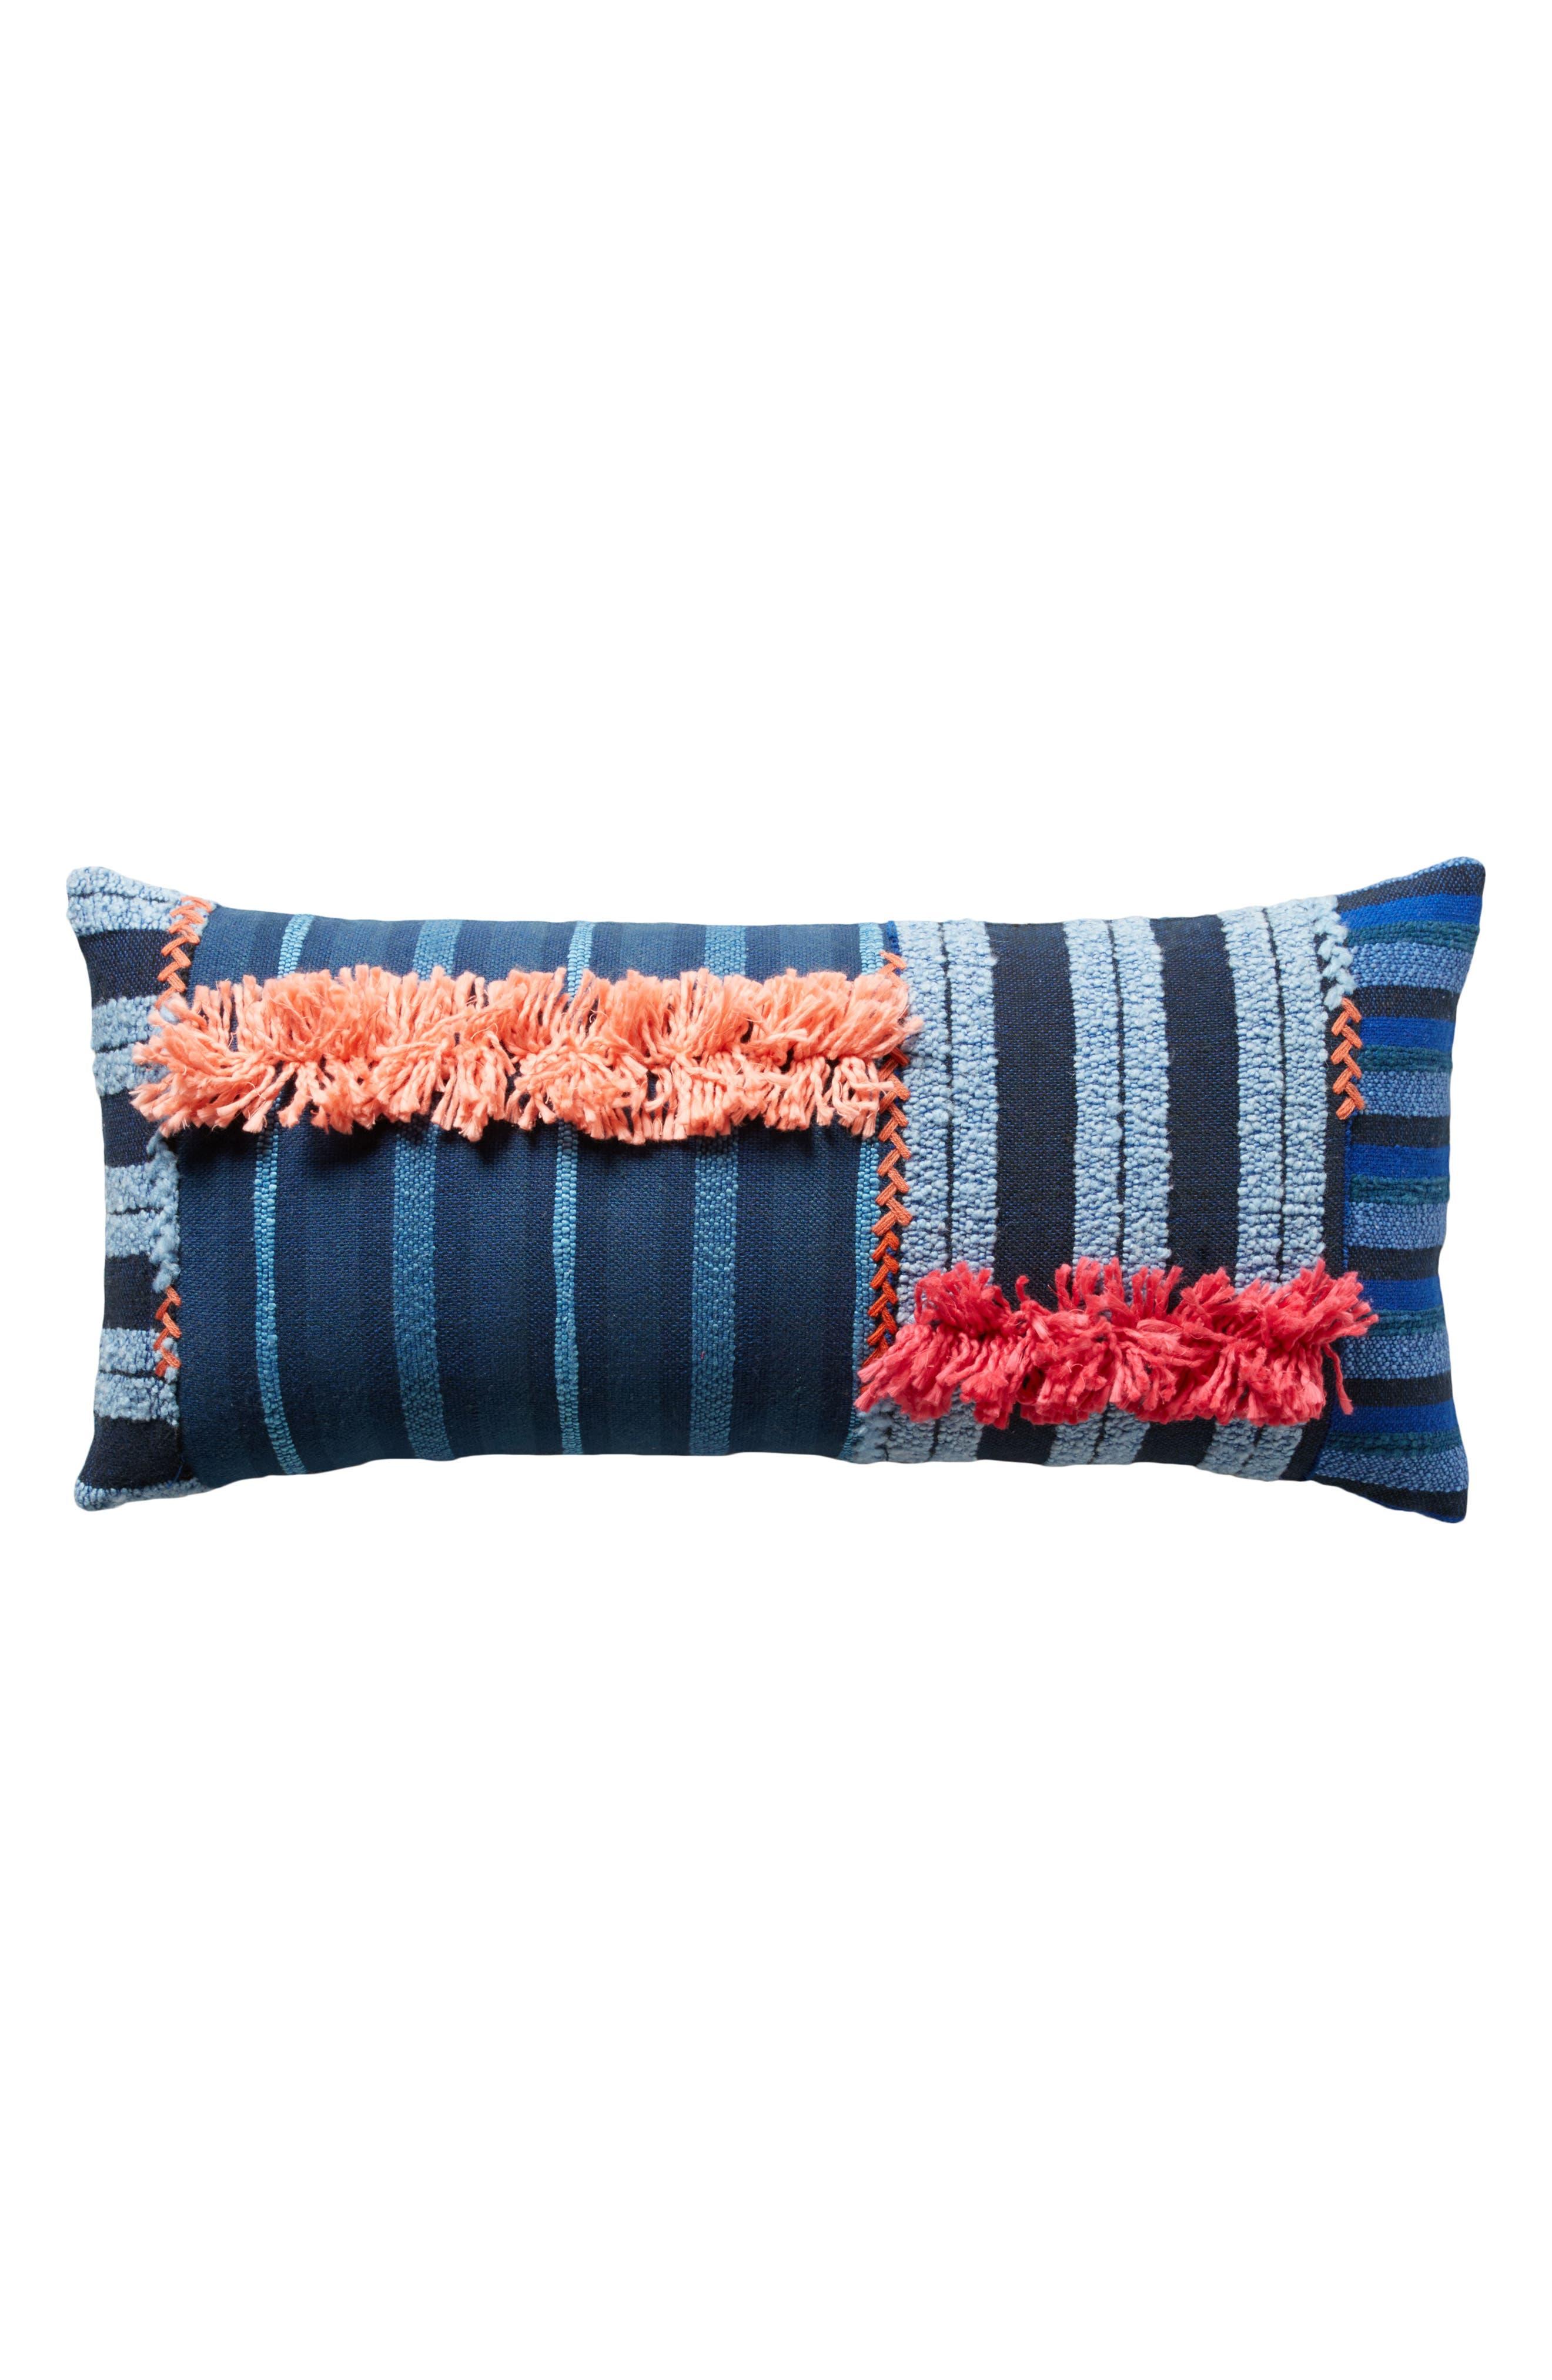 Yoursa Accent Pillow,                             Alternate thumbnail 6, color,                             Blue